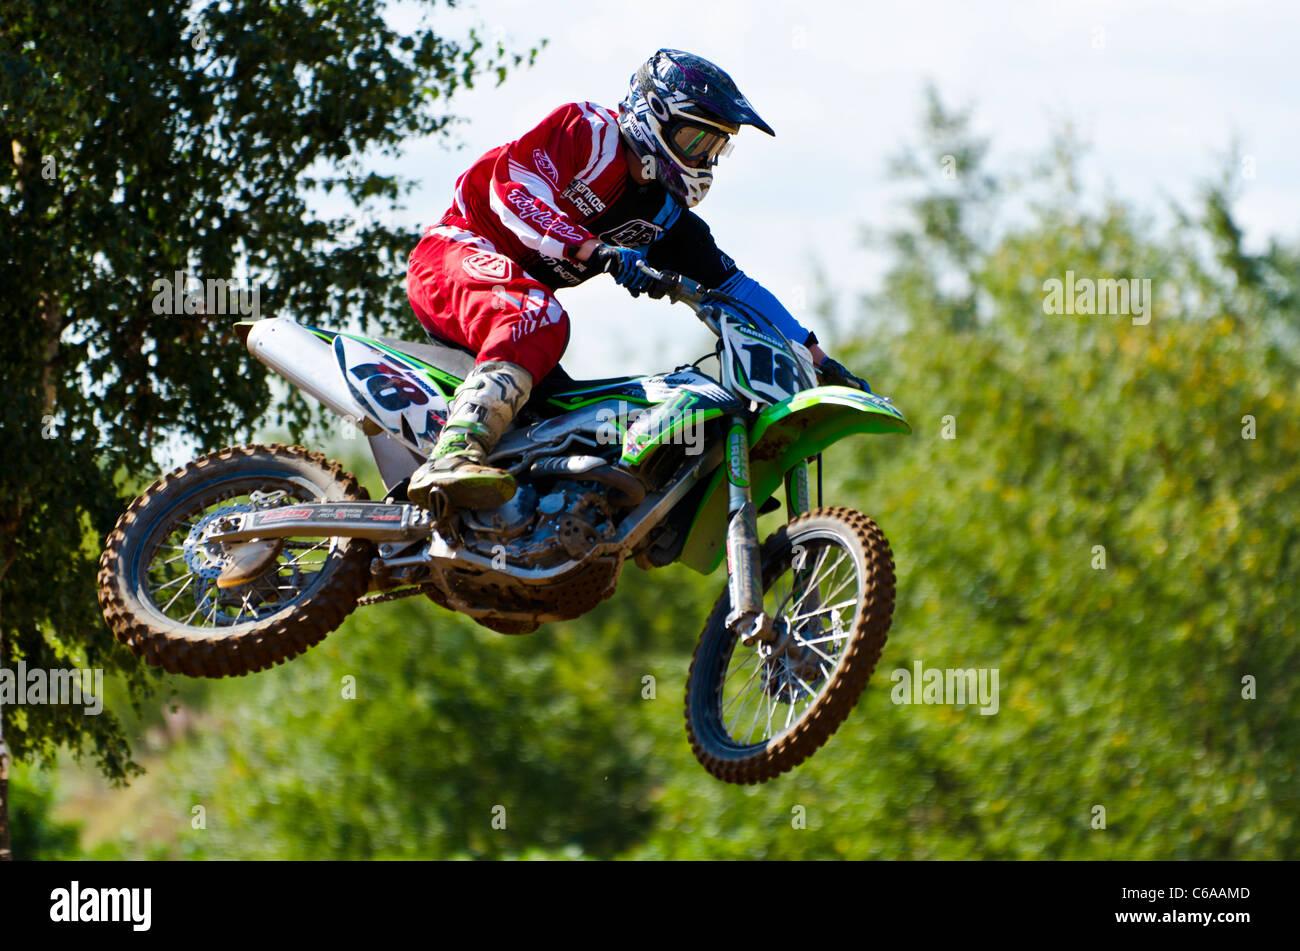 Motocross Racing @ Finningley, Yorkshire, United Kingdom - Stock Image